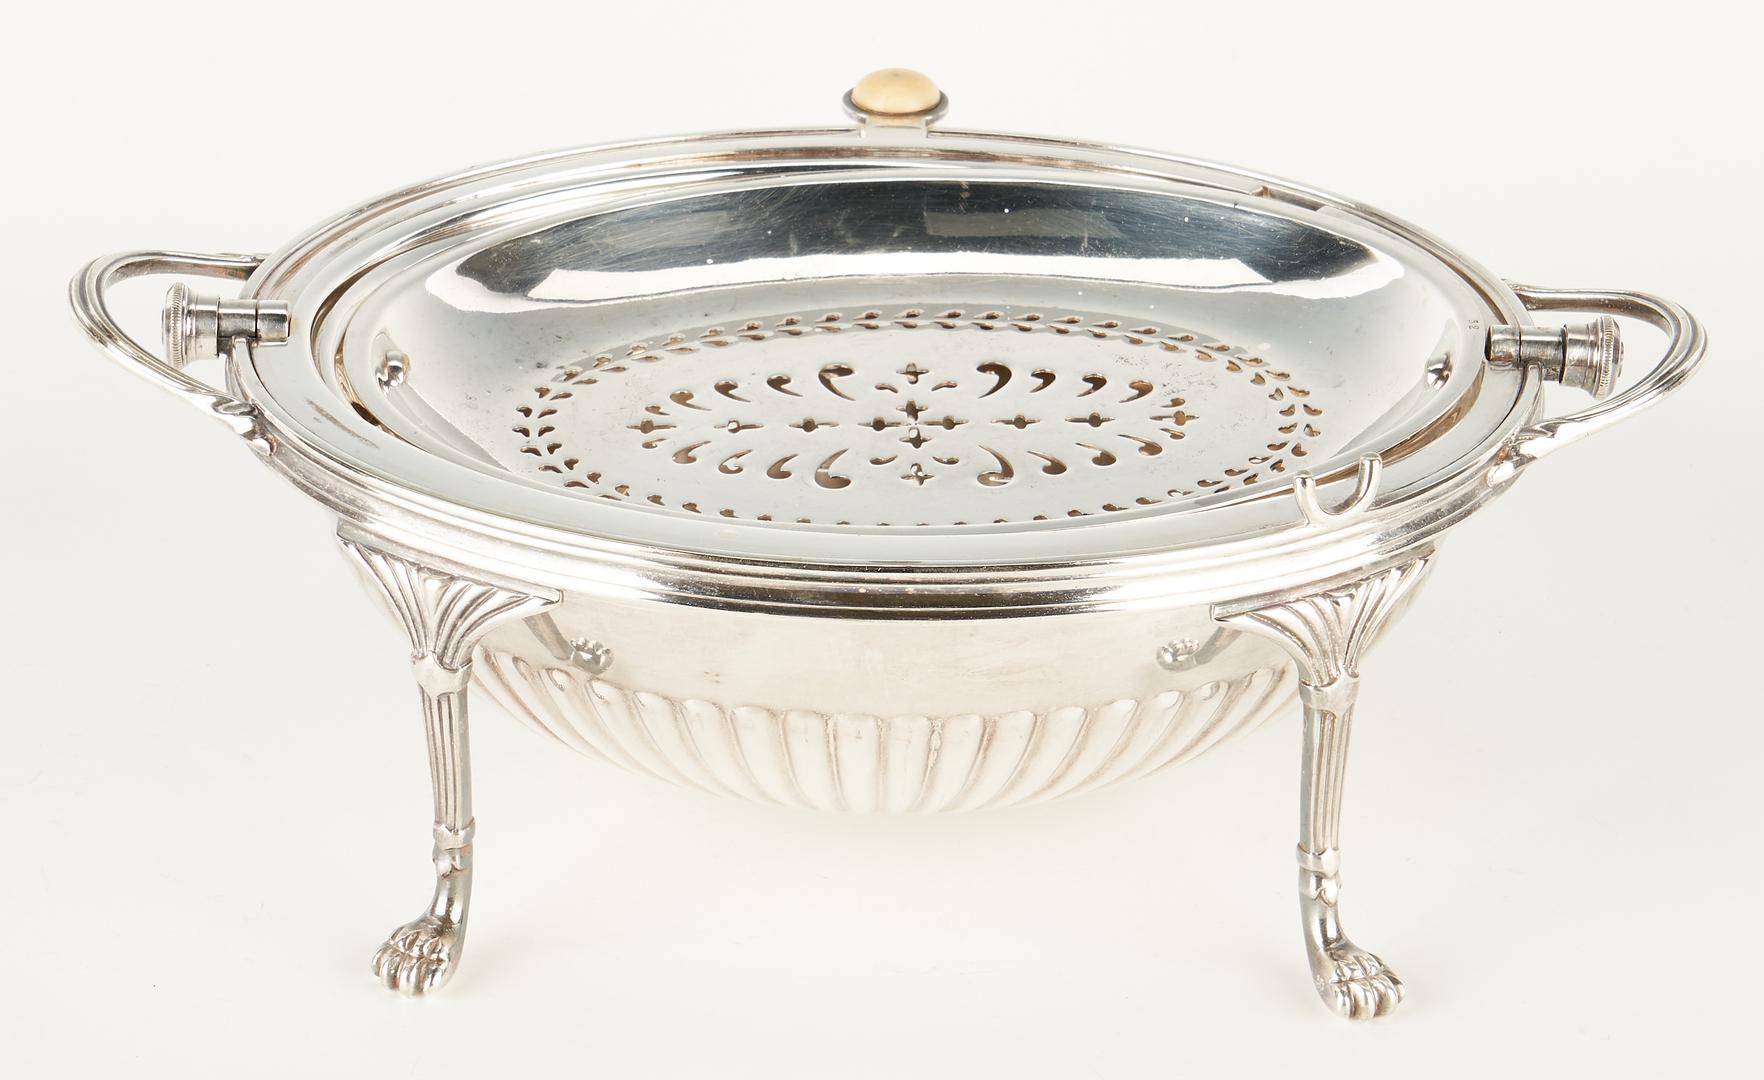 Lot 1242: 12 Sterling Spoons plus plated sugar bowl, server & candlesticks